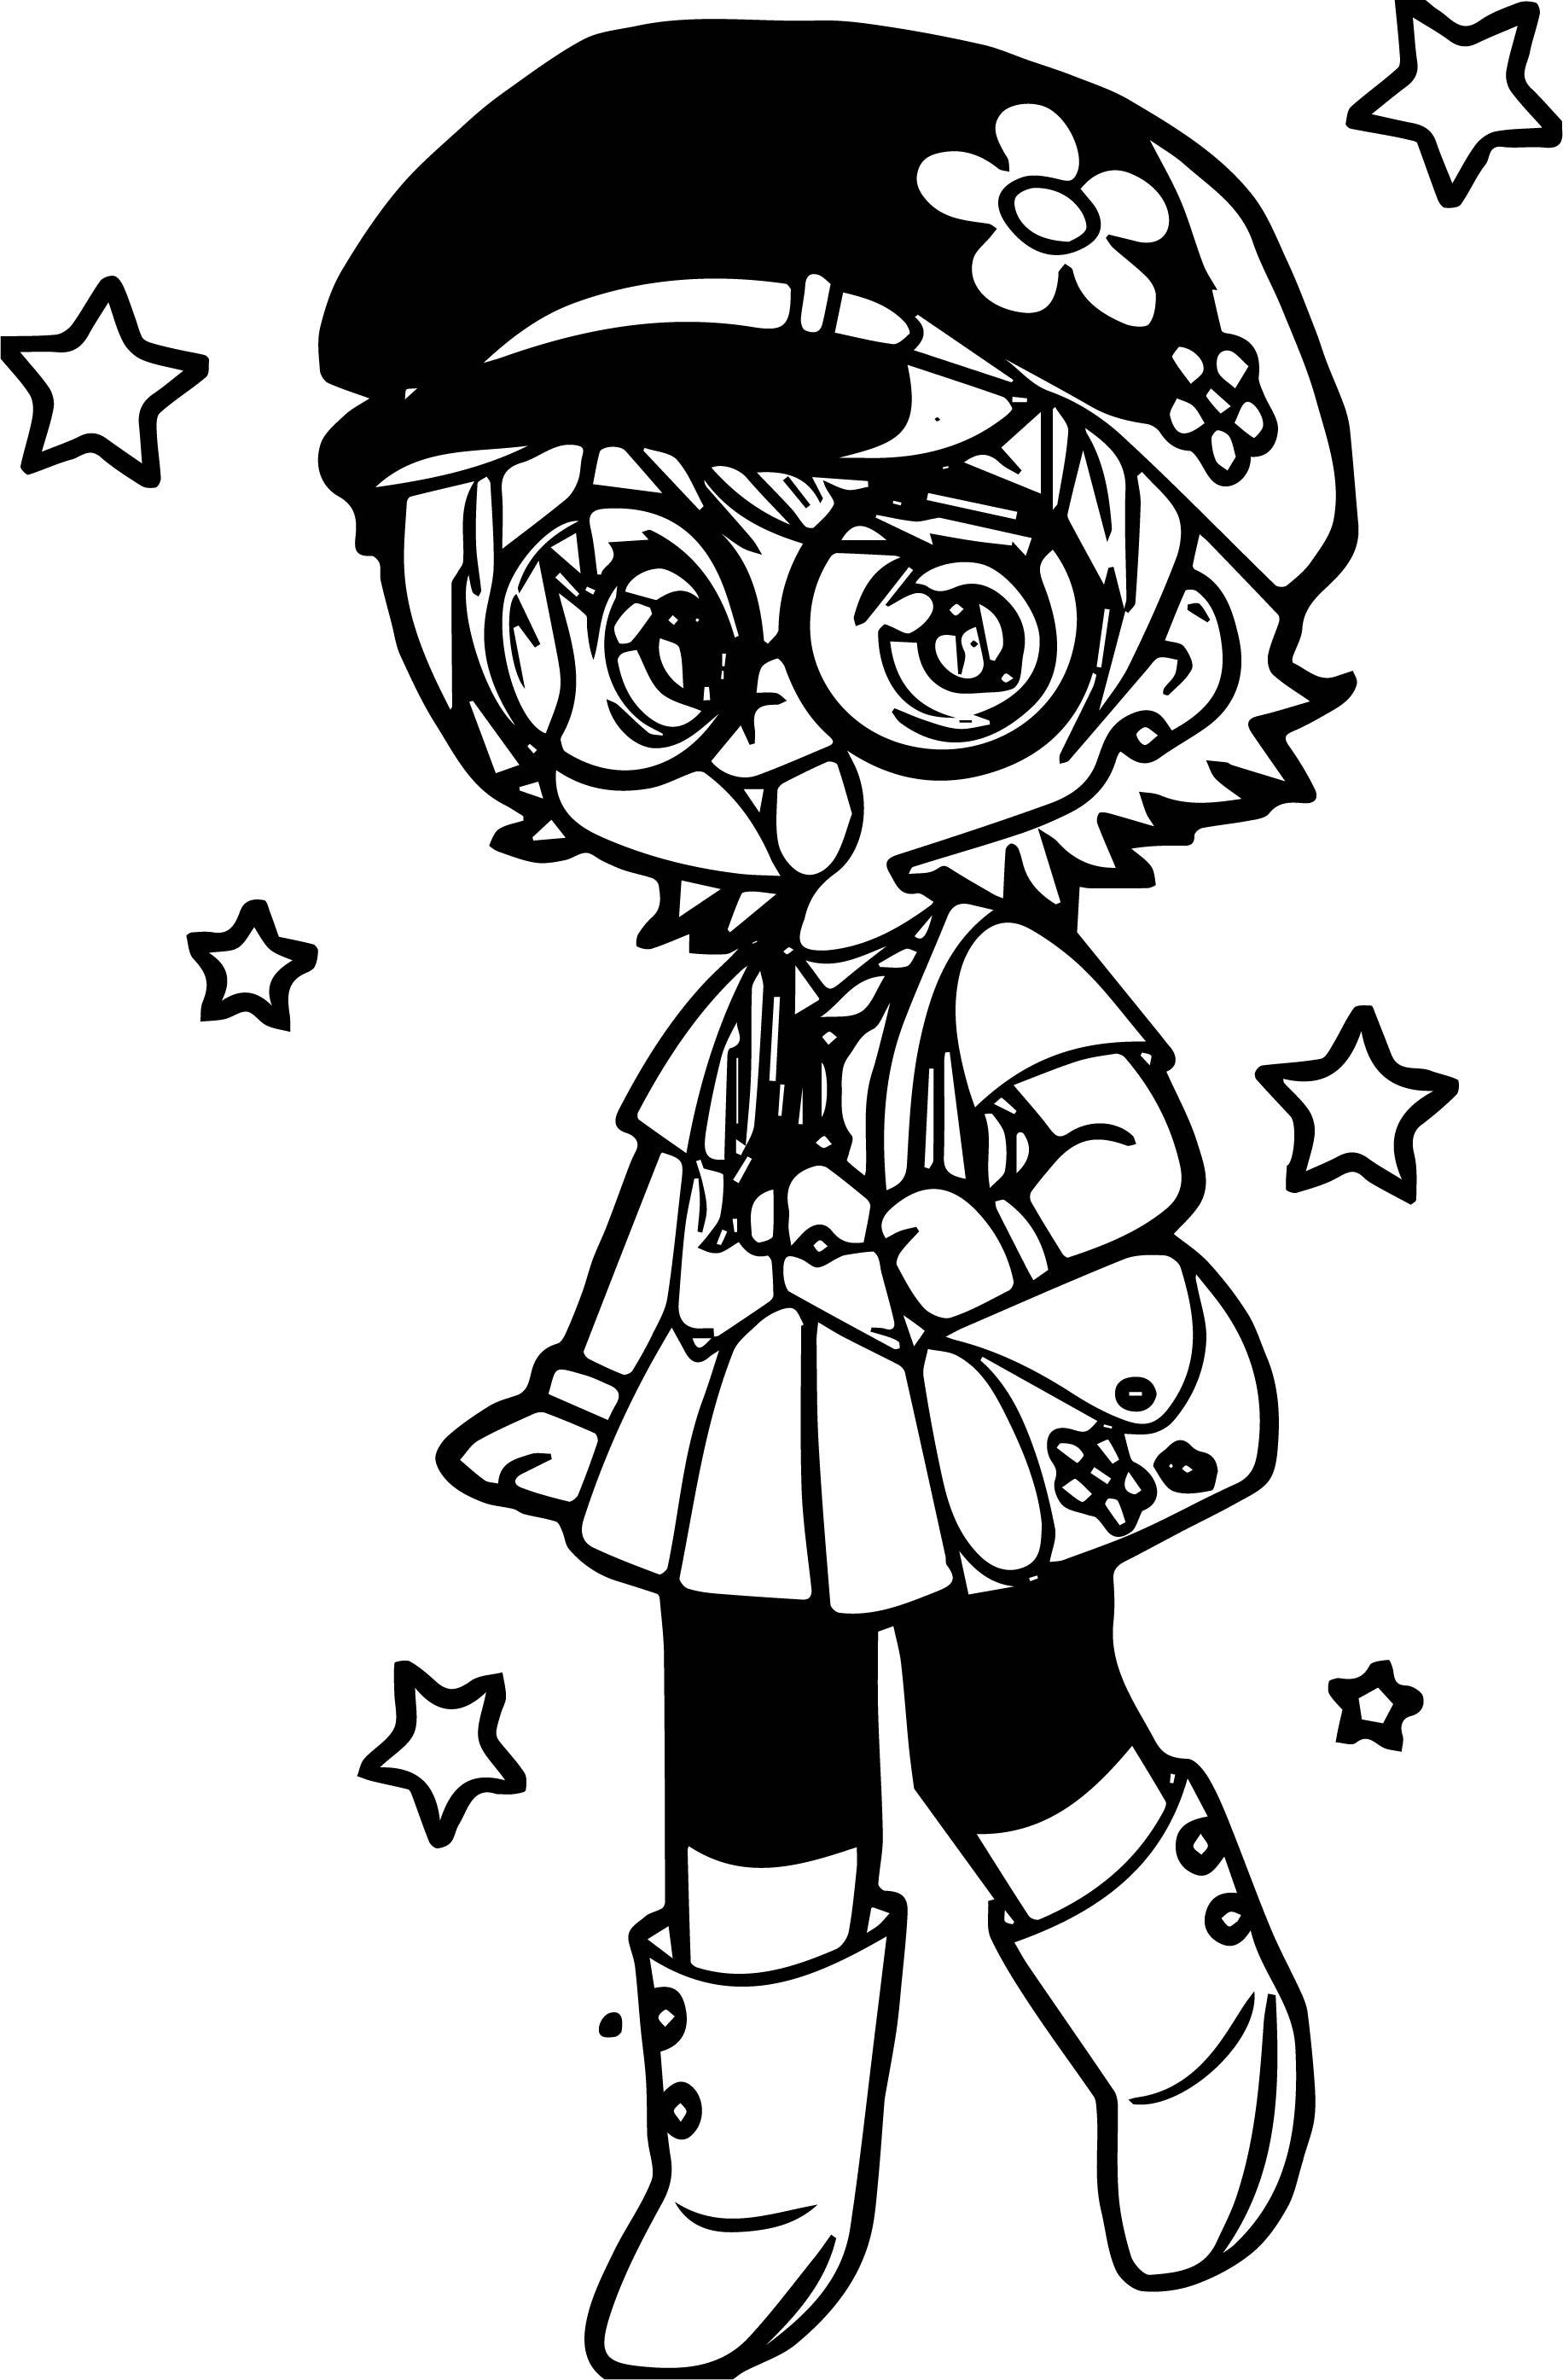 Manga Stars Girl Coloring Page